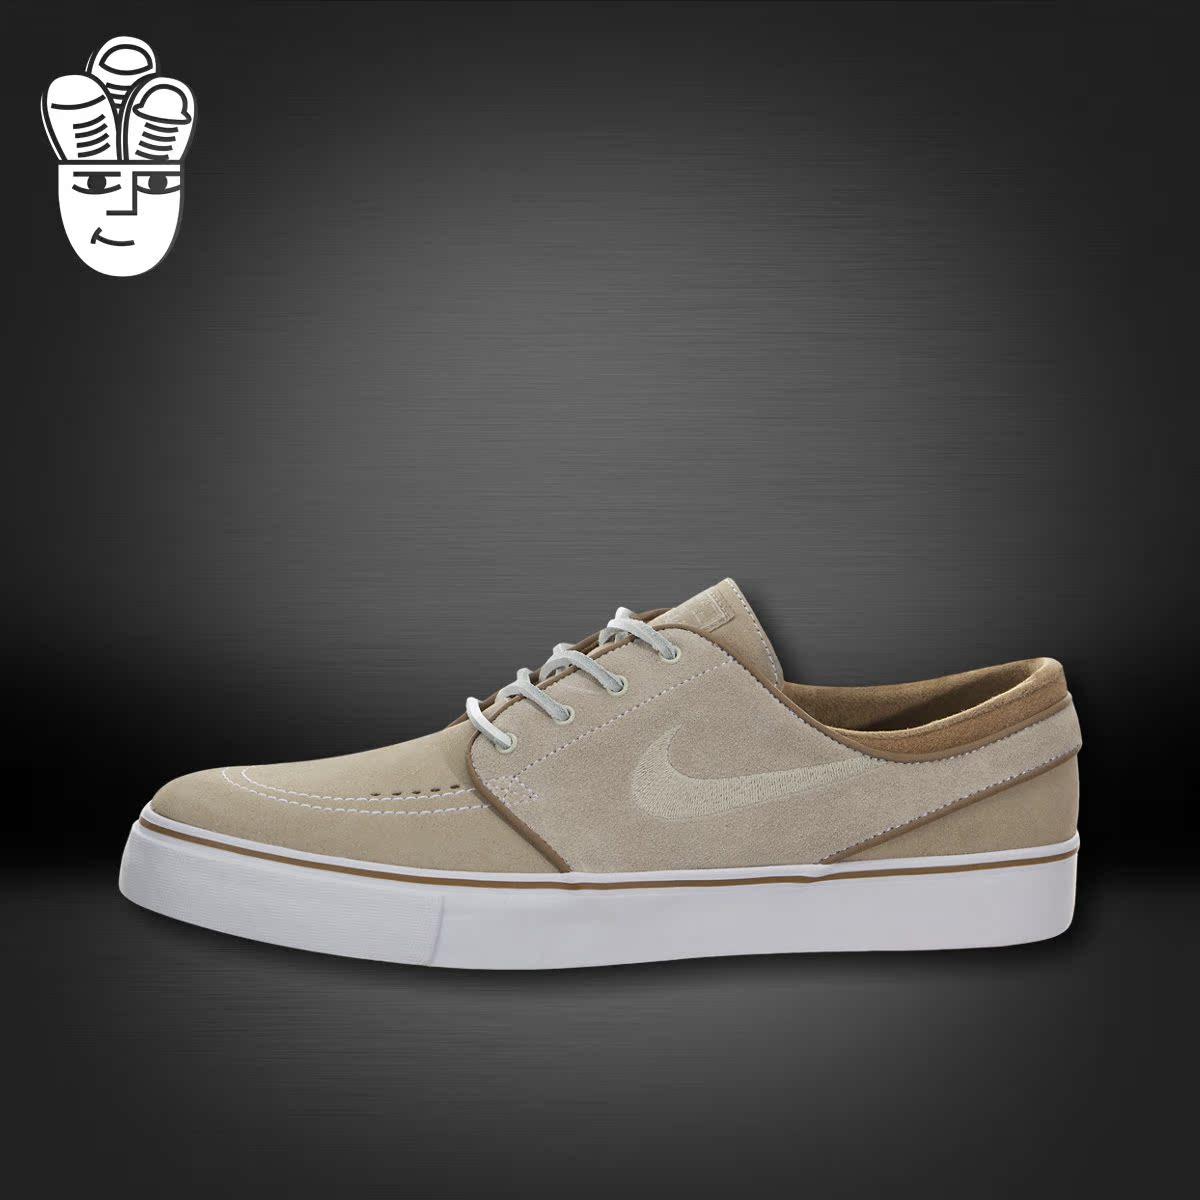 386bddd48211 Nike SB Lunar Stefan Janoski Men s Skateboard Shoes Men s Shoes Athletic  Shoes